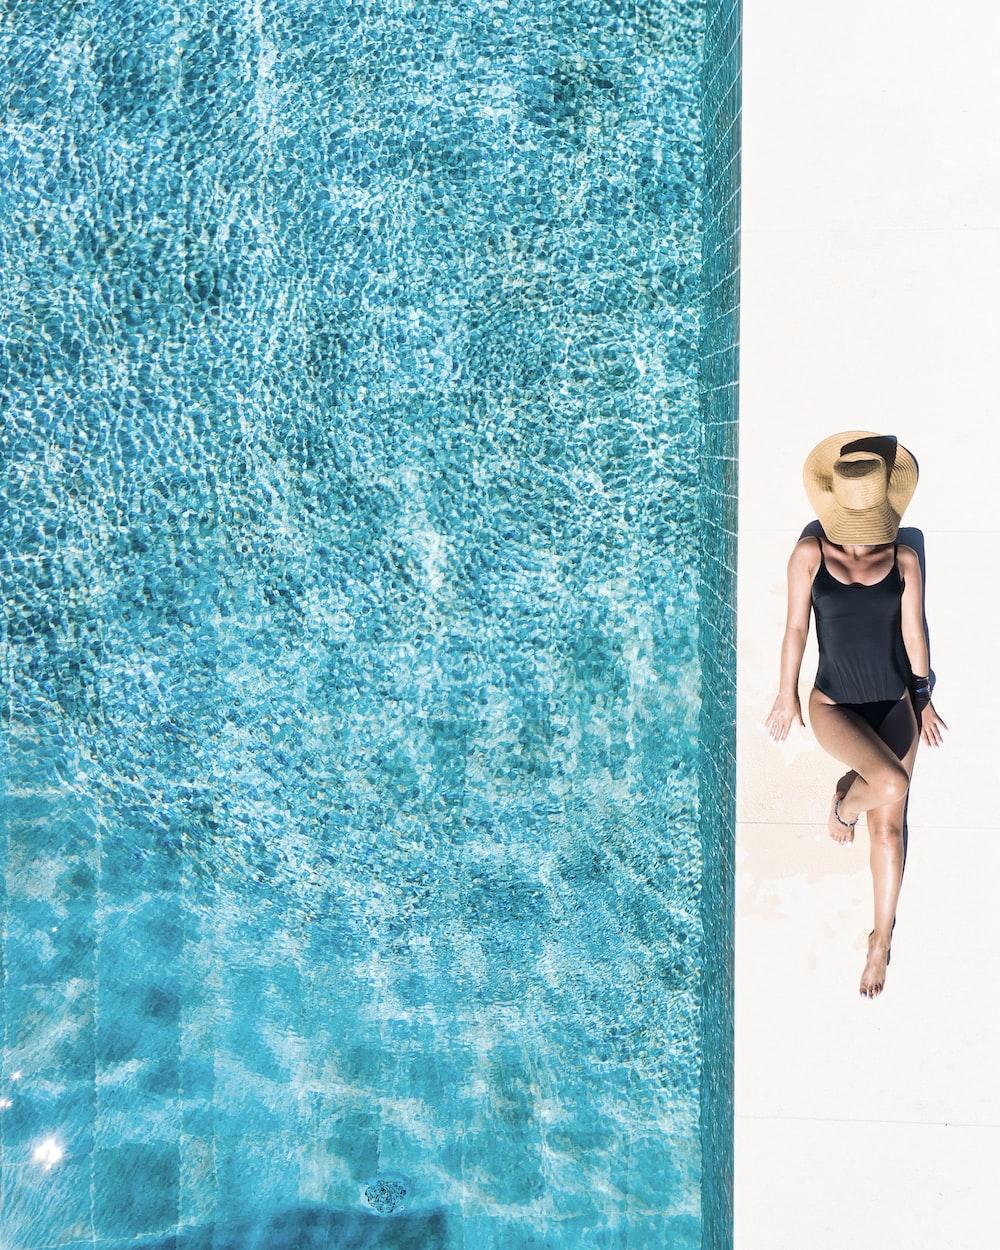 woman in black bikini bottom and white sun hat standing on blue water